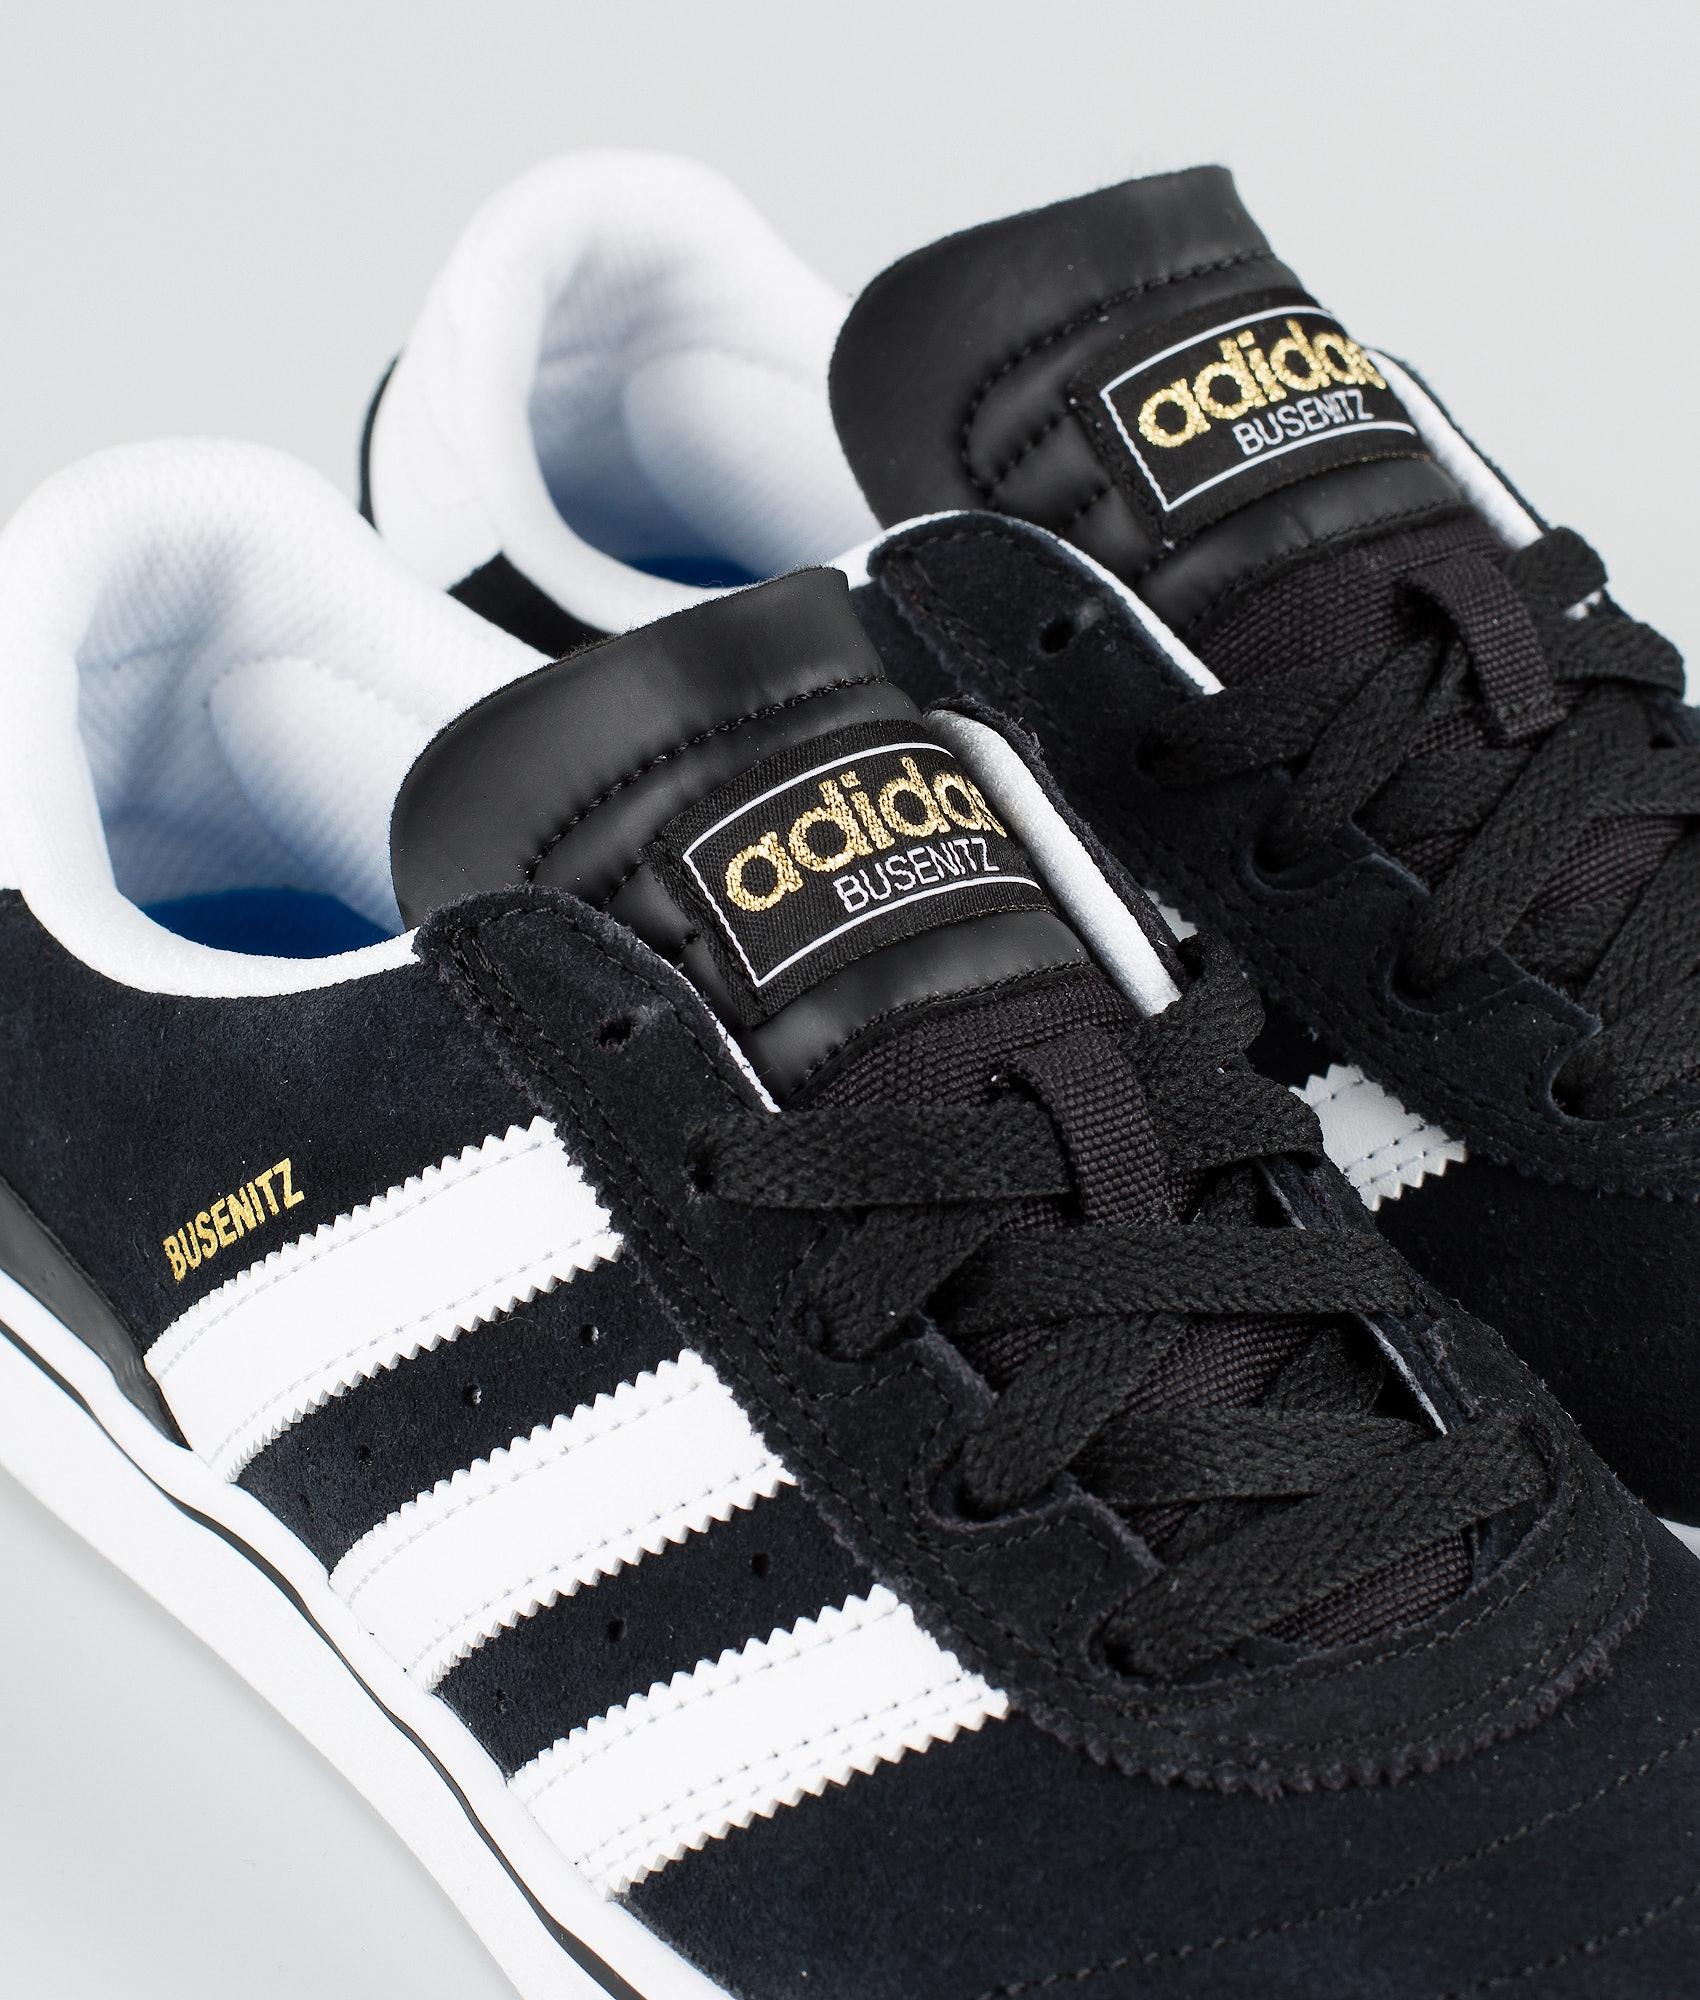 40c47385b55 Adidas Skateboarding Busenitz Vulc Shoes Black1/Running White/Black1 ...